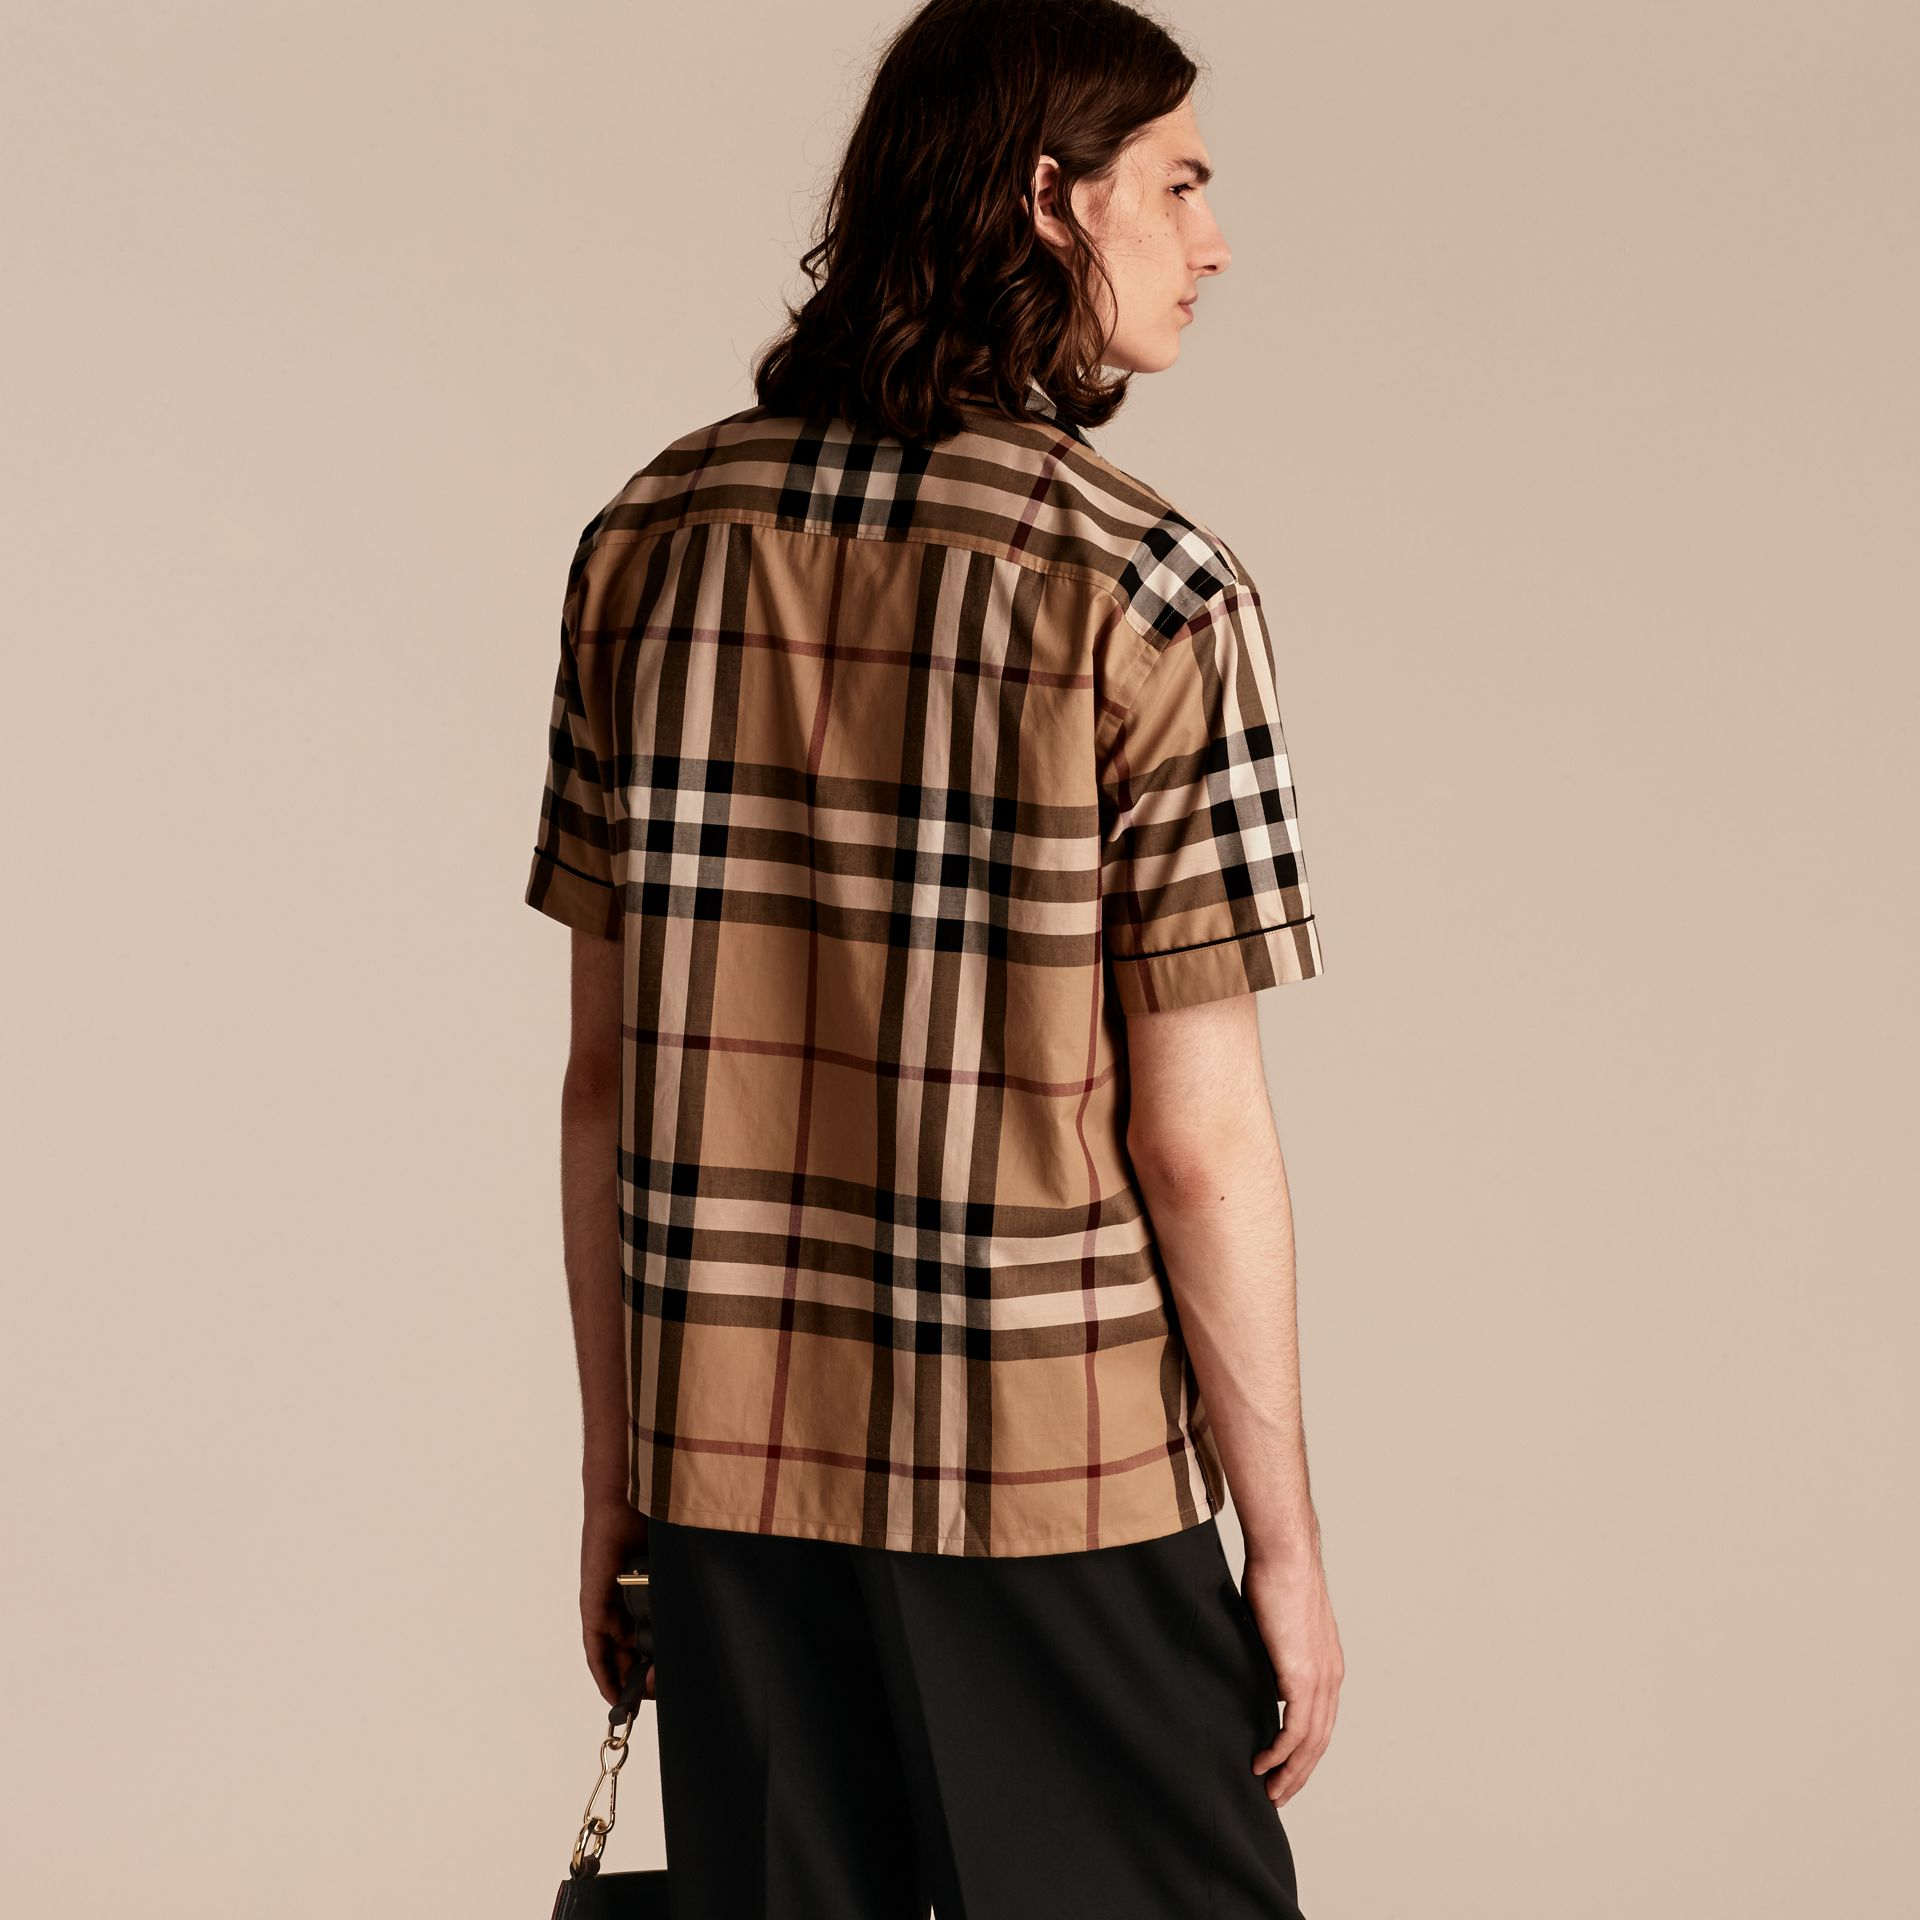 Cotton Poplin Pyjama-style Shirt in Camel - gallery image 3